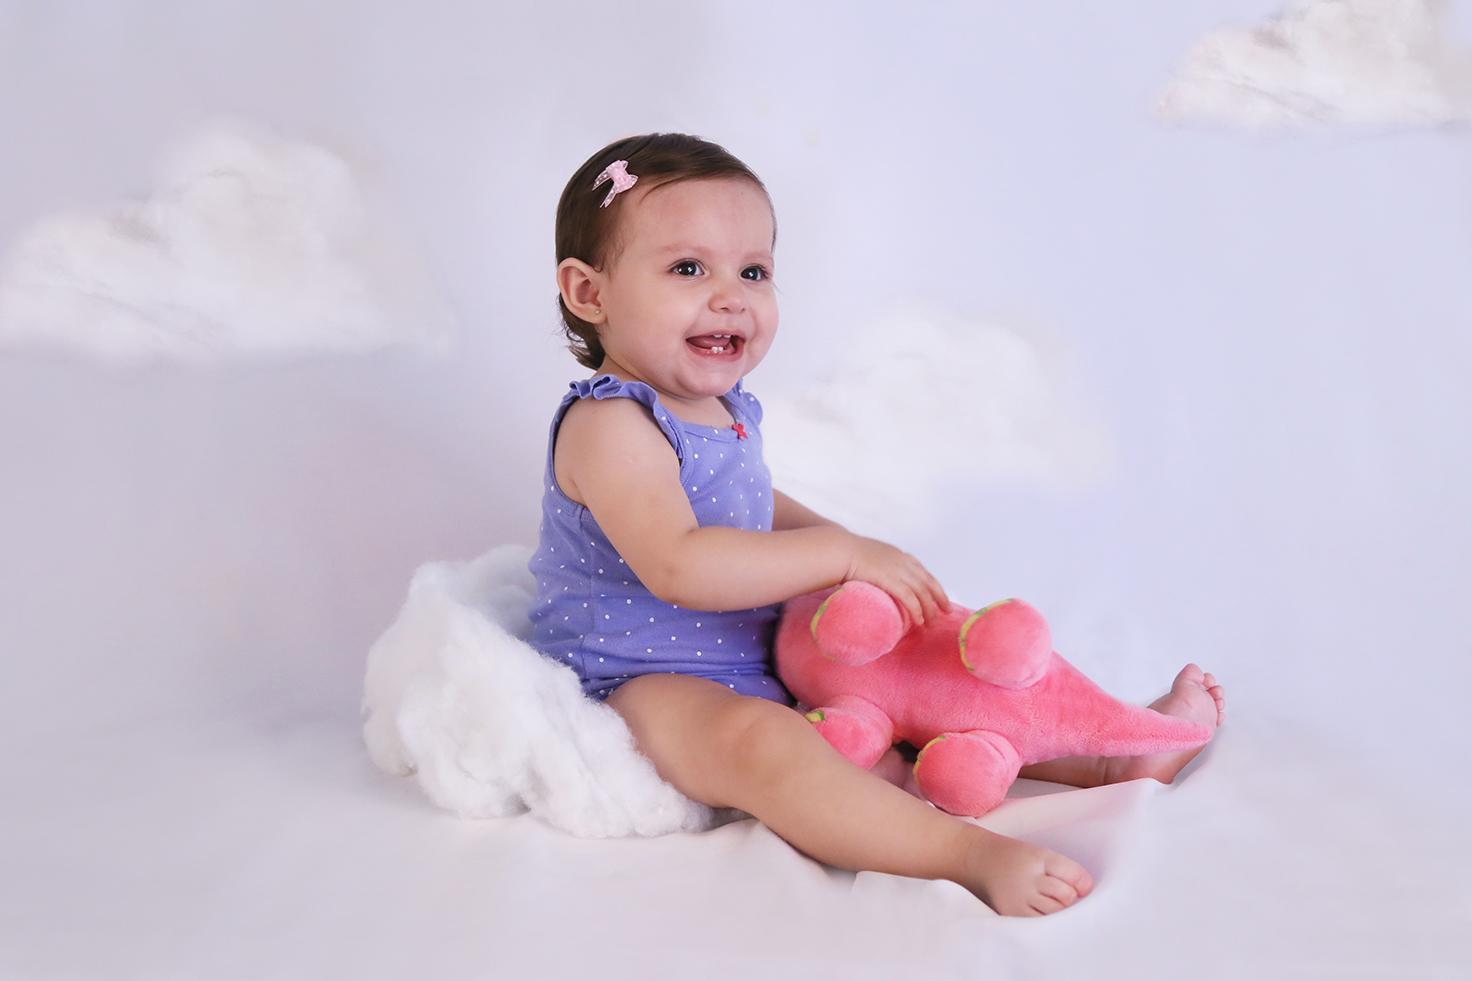 Maroge-Angela-Velazquez-fotografia-bebe-22